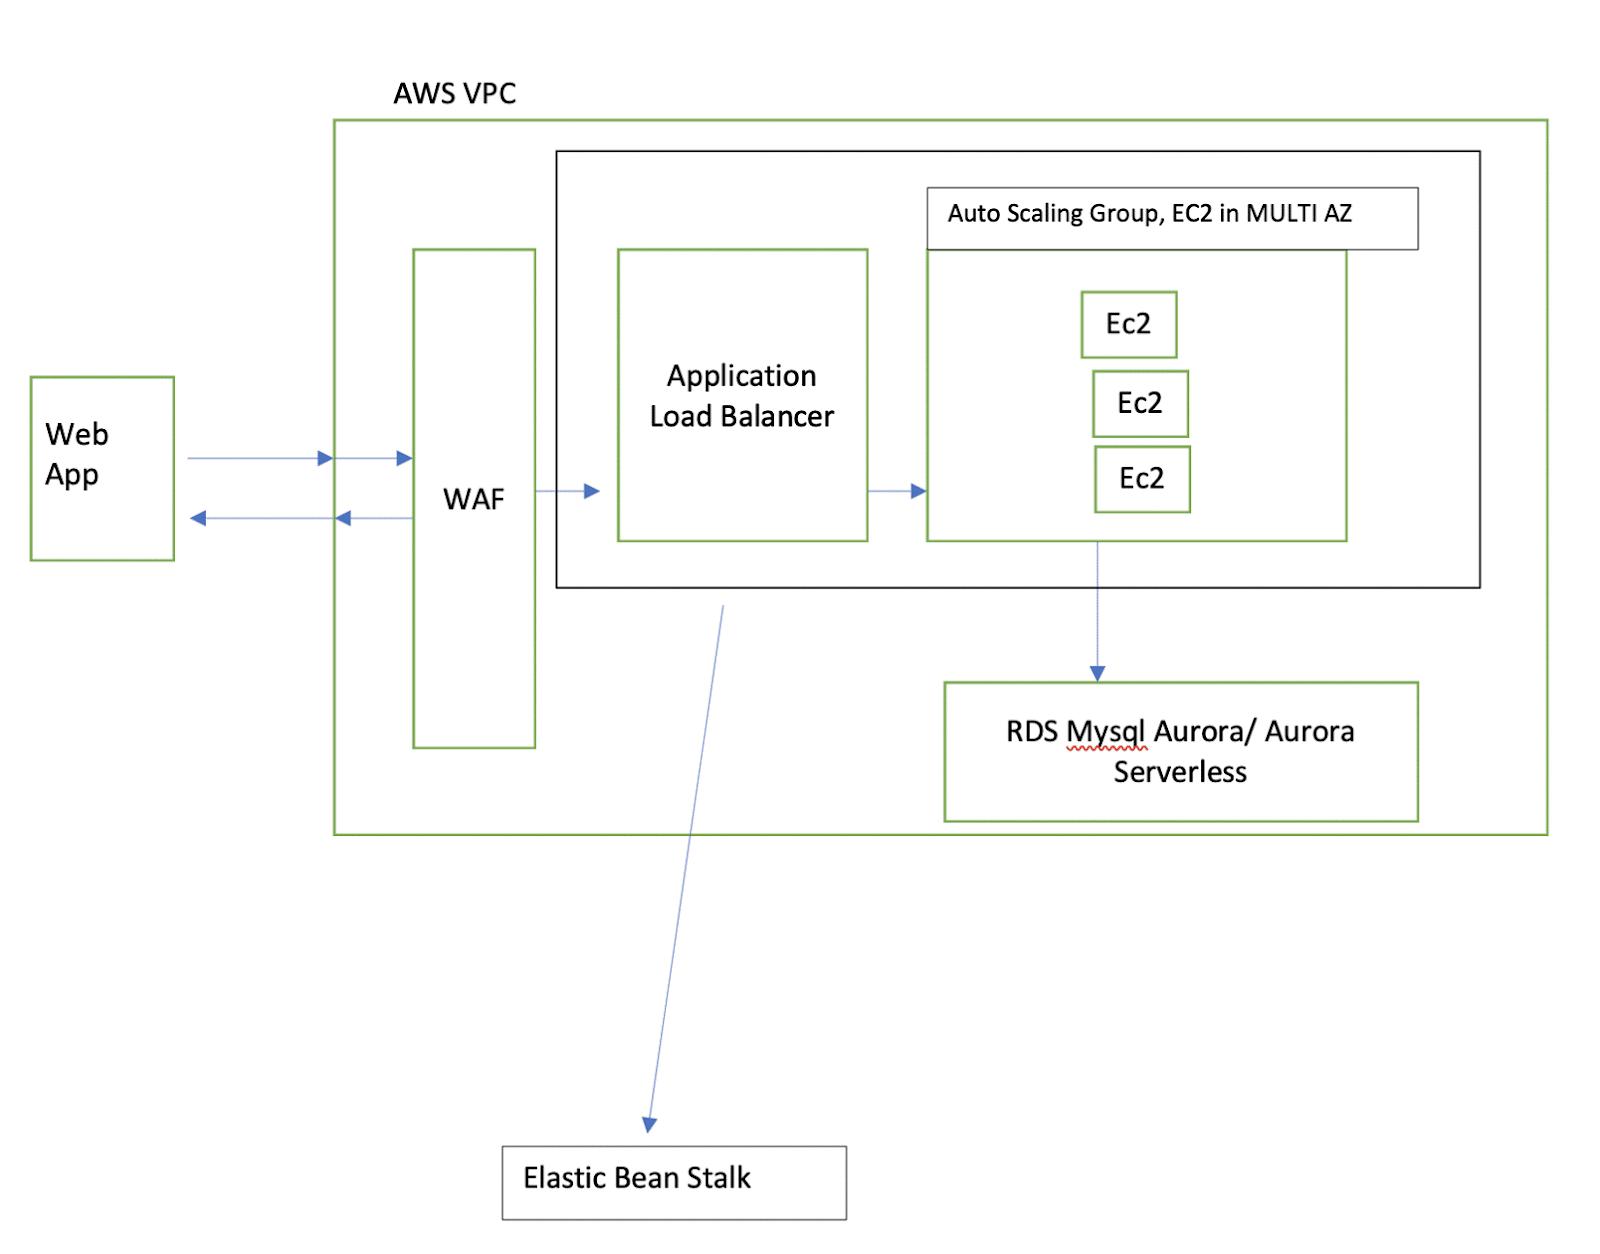 Solution Architecture